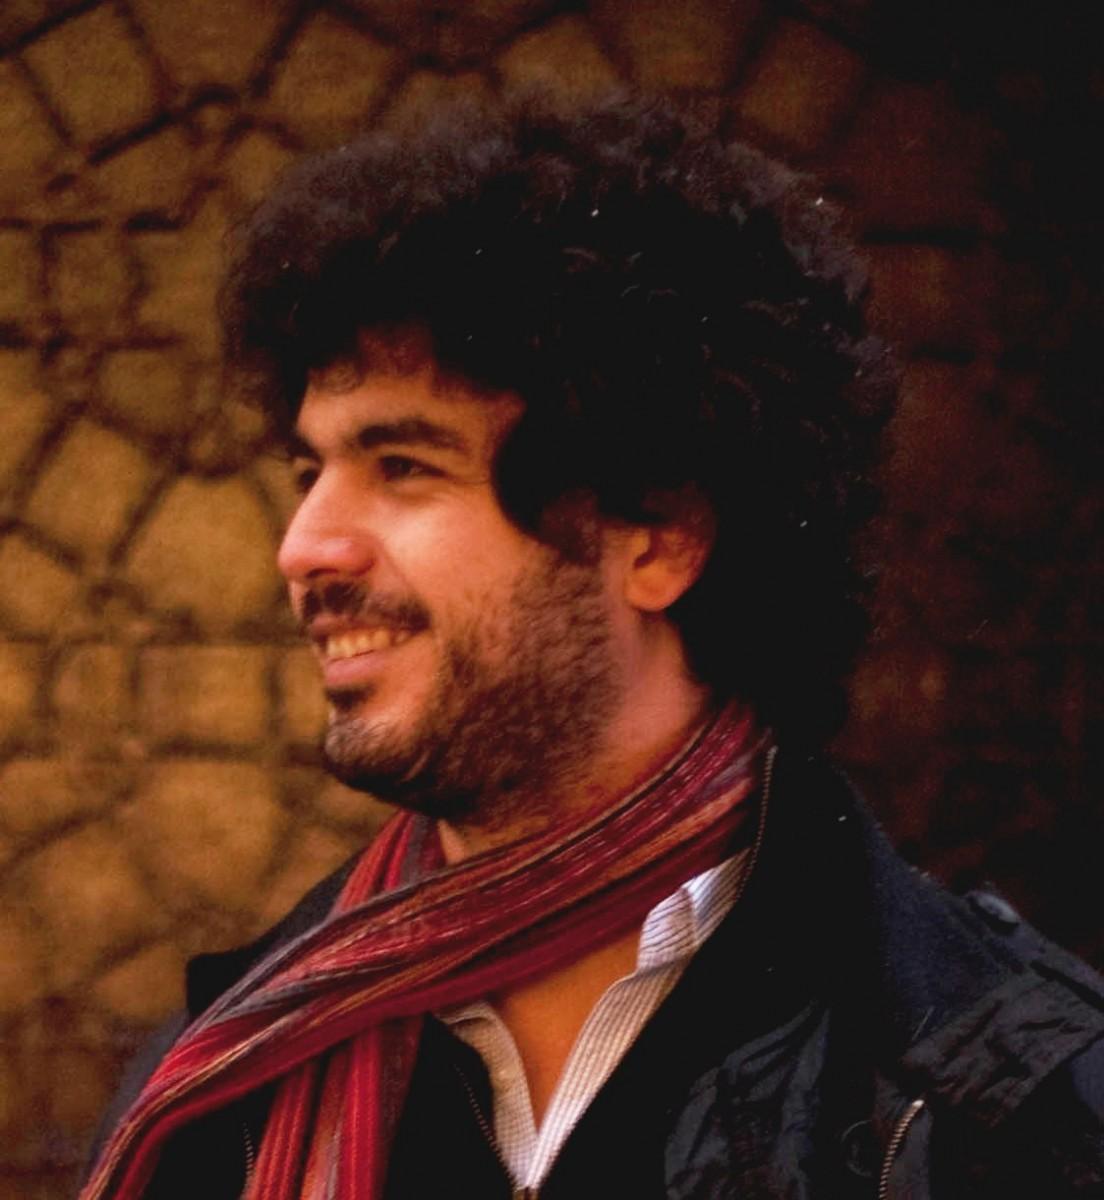 PAS Nantes 2012 - Yoel Meranda (Turquie) - Producteur - THE CLIFF SHORE